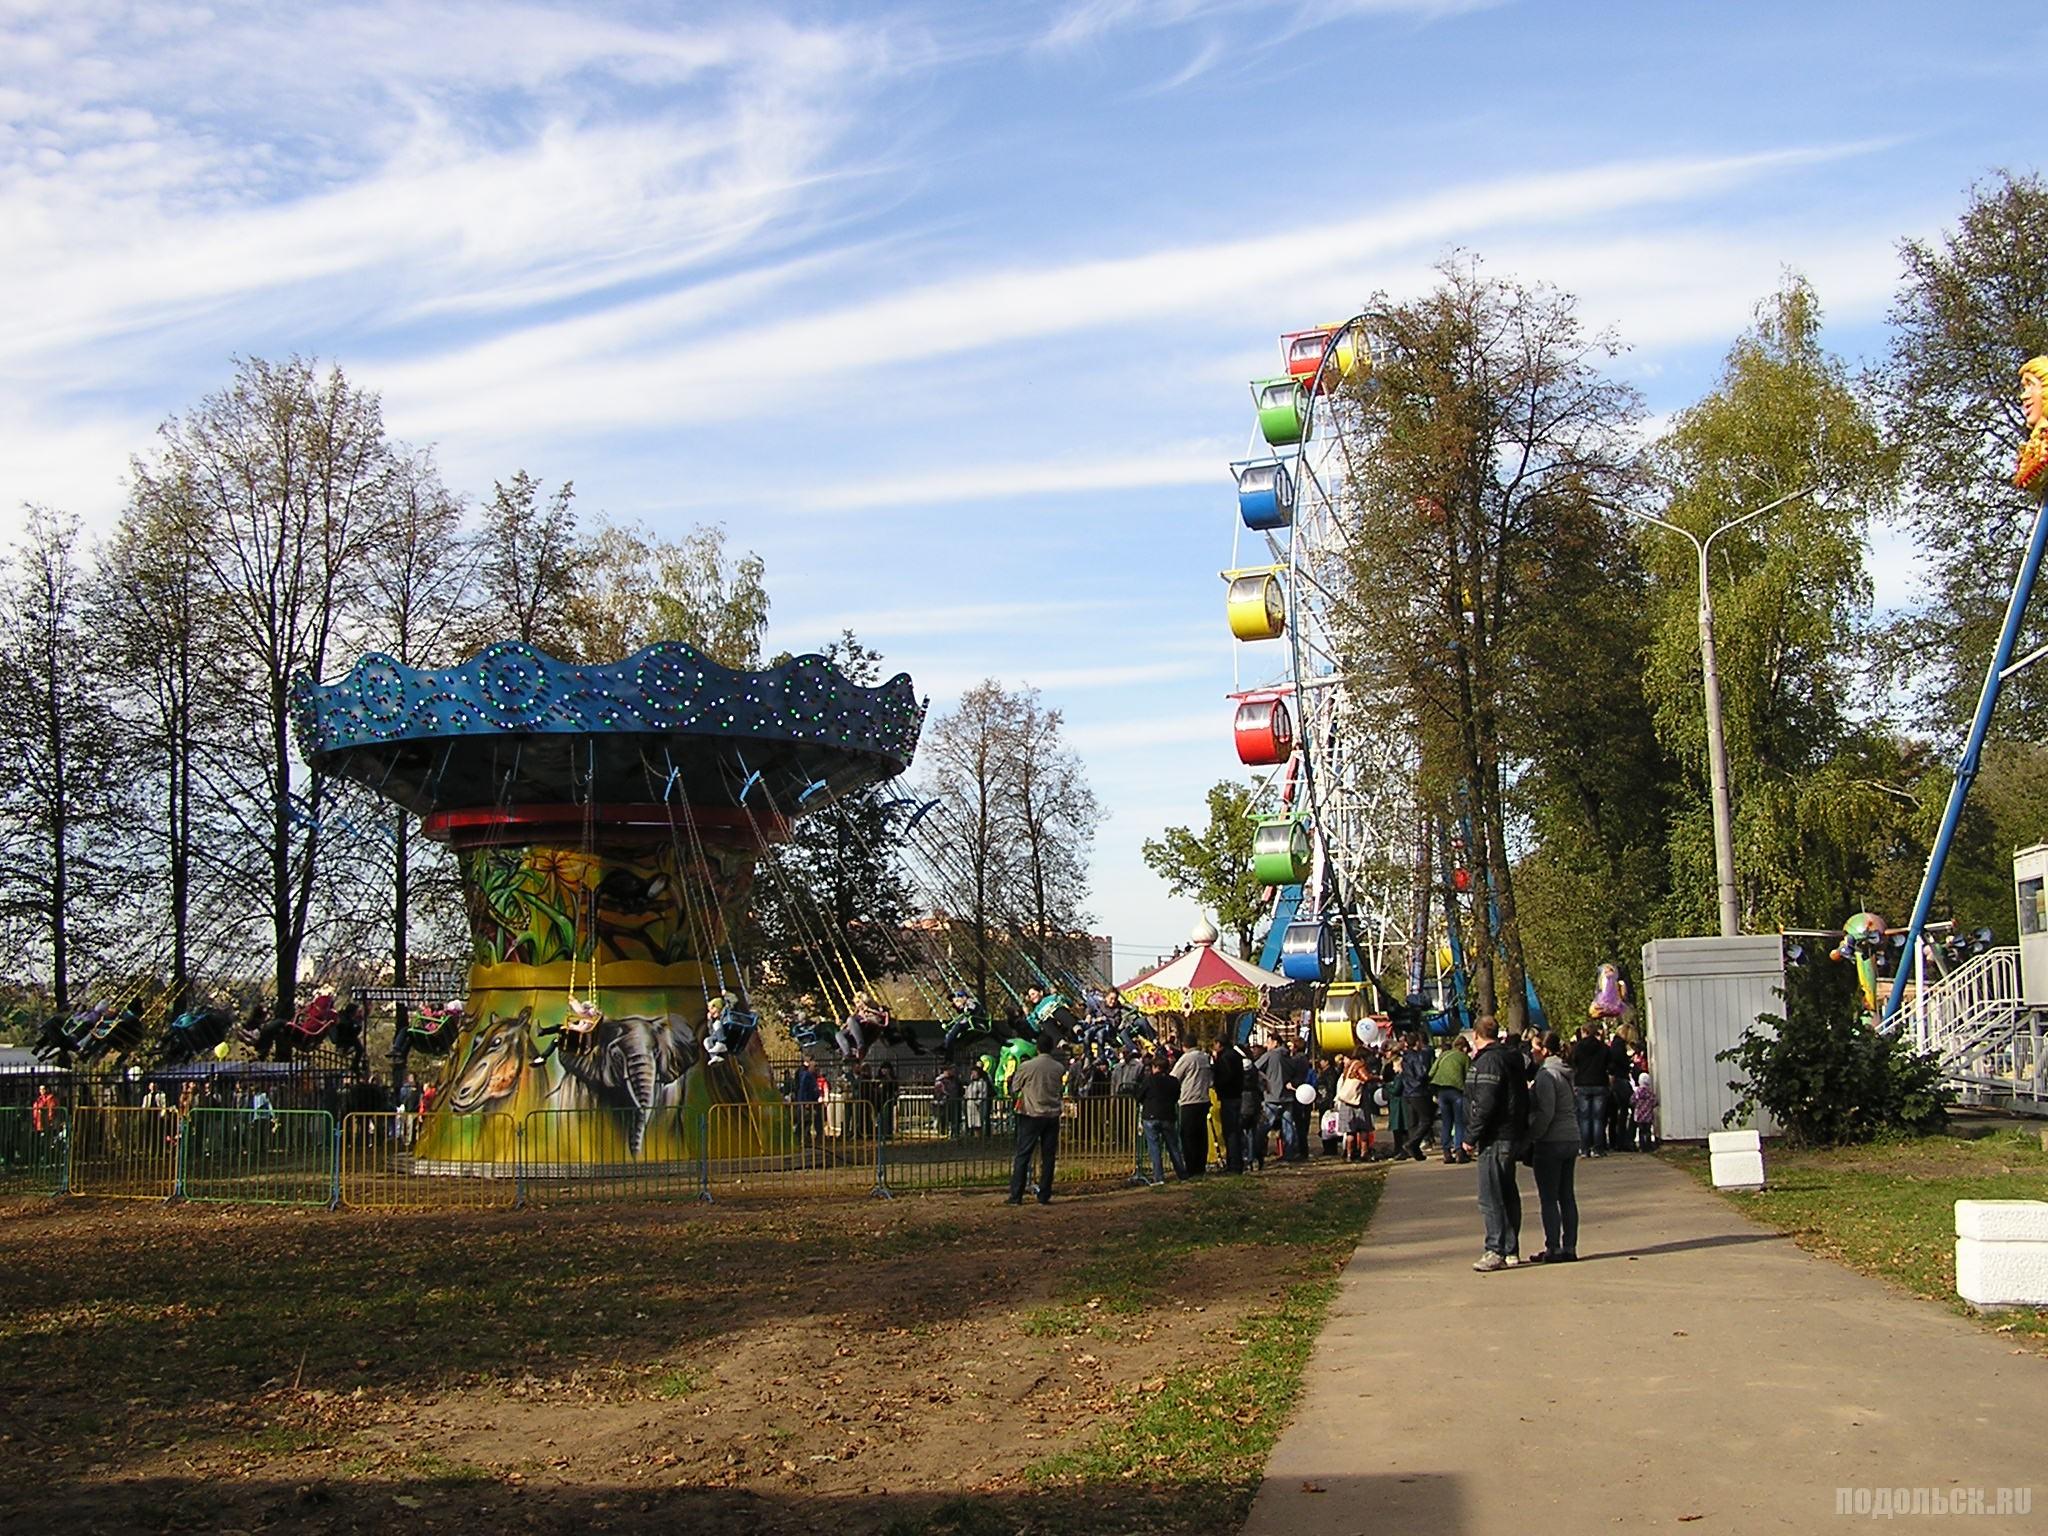 Аттракционы в парке 4 октября.